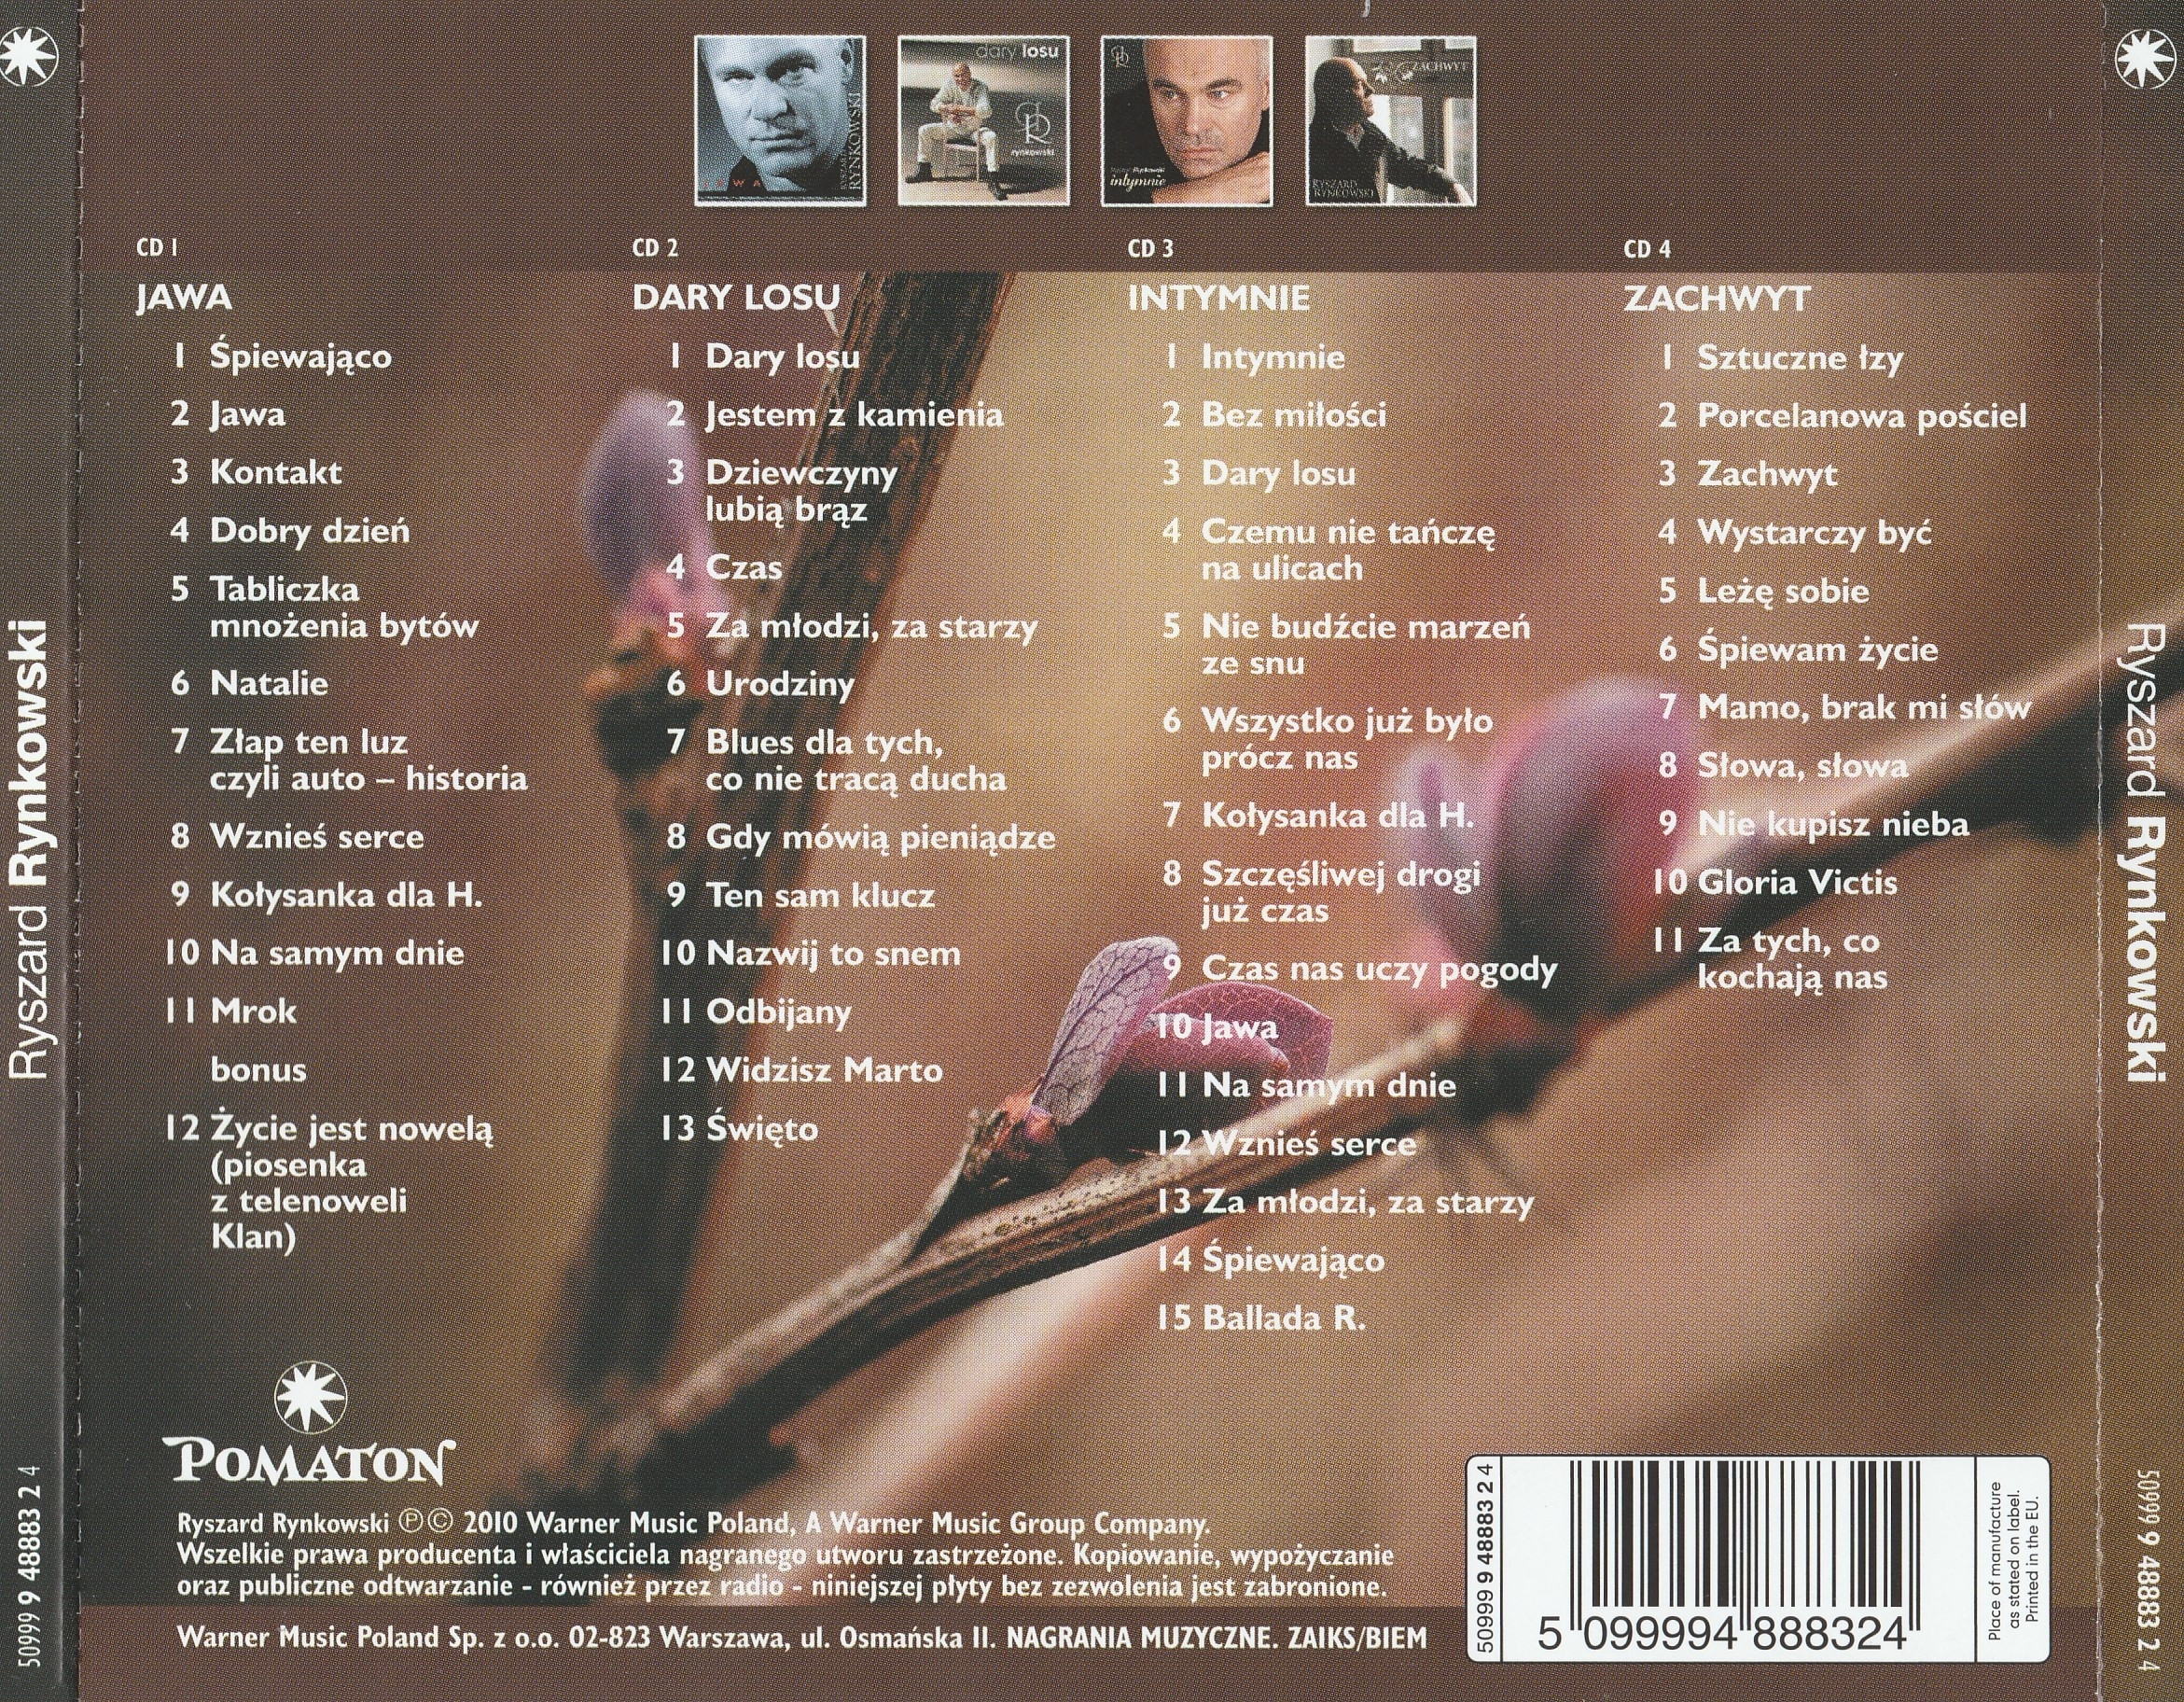 Ryszard Rynkowski - 4CD (1997-2009) - 2010 [lossless] - Âñå